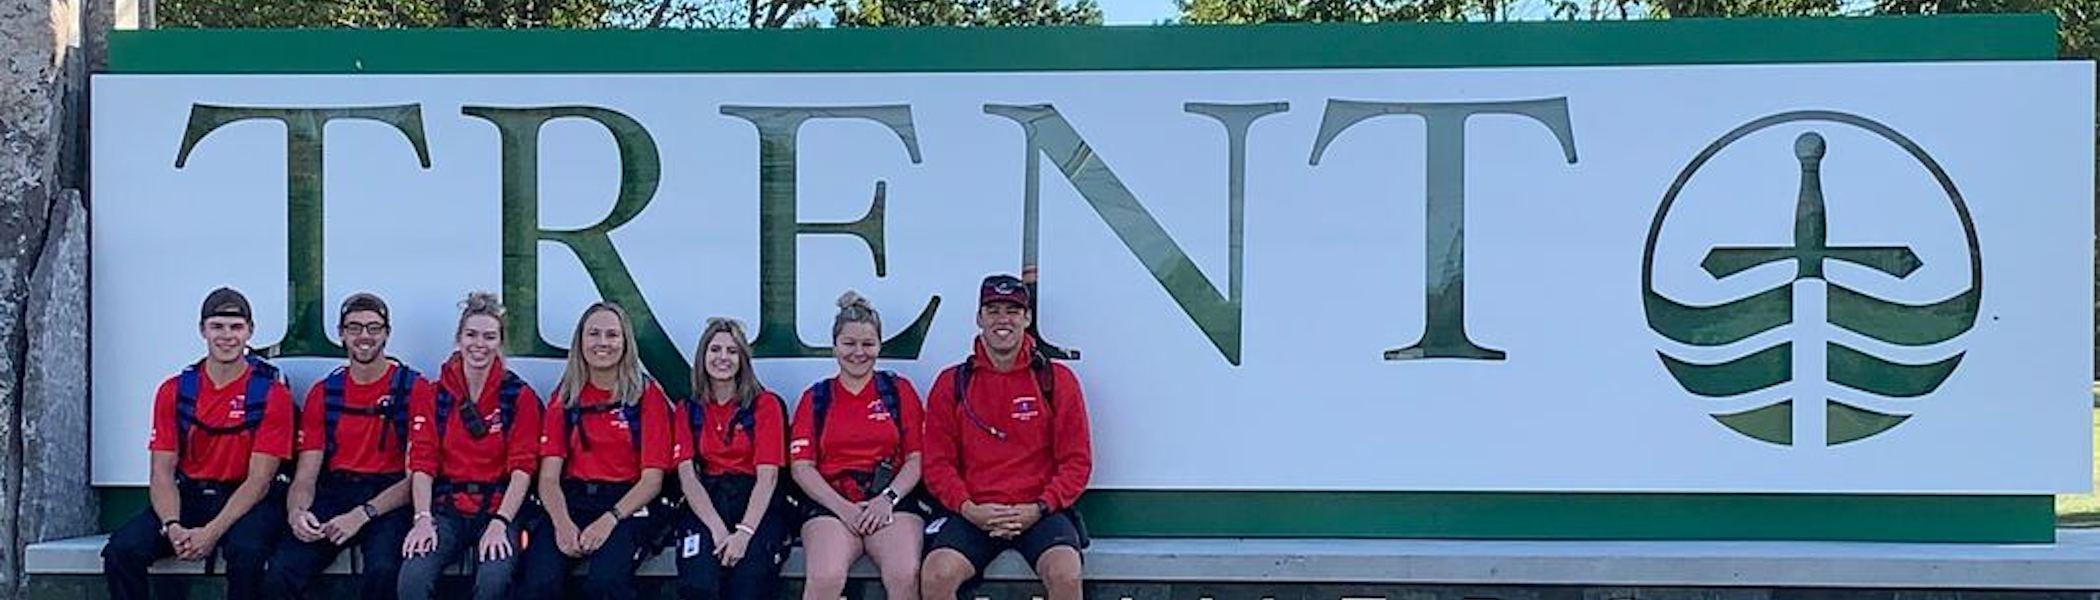 Students sitting alongside the Trent University entrance sign.